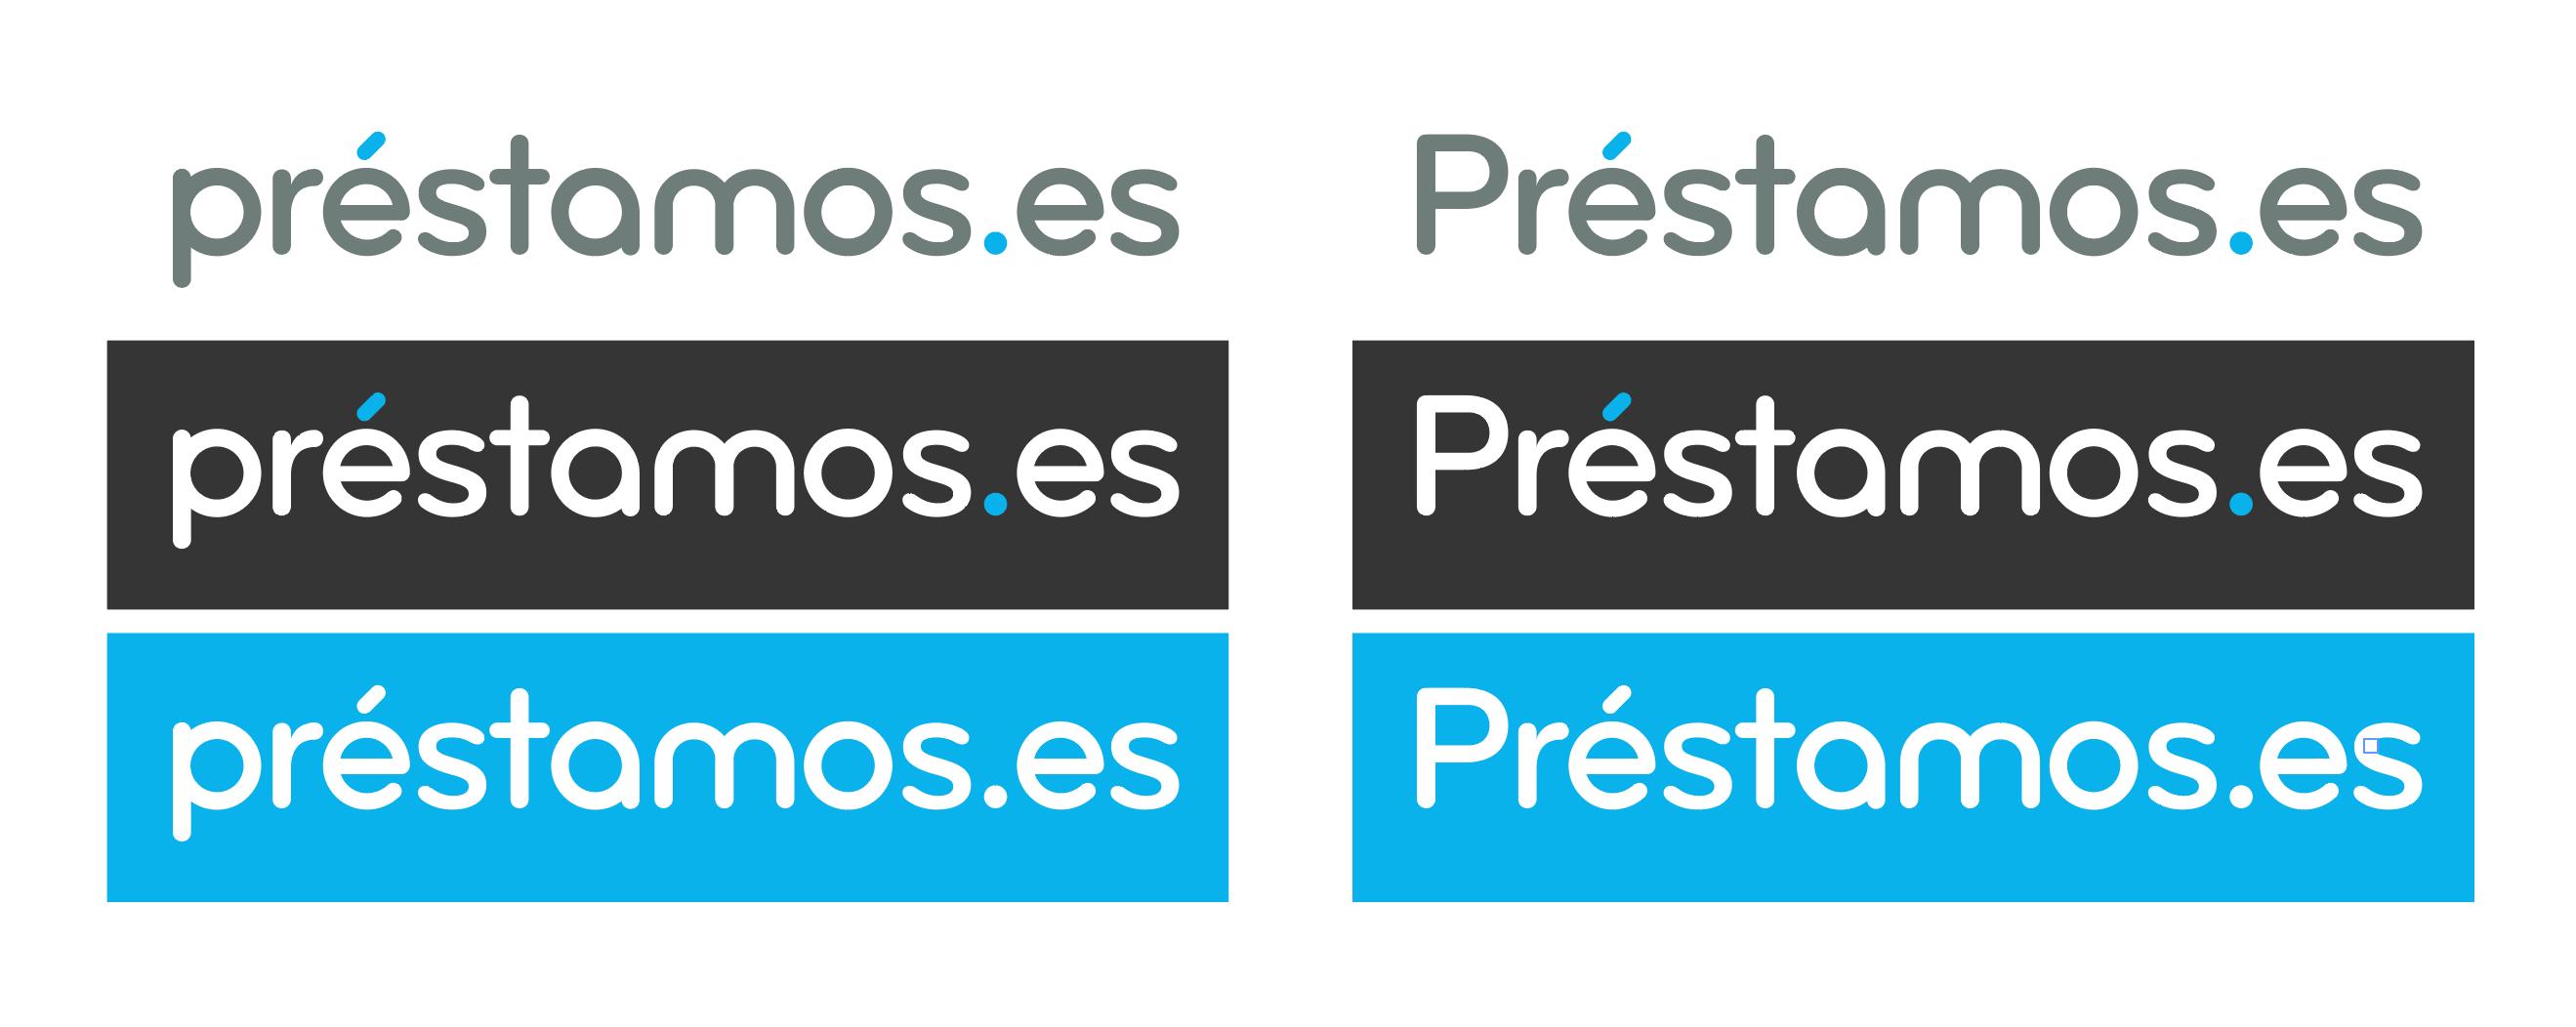 Préstamos.es (based on lån.no and lån.nu)